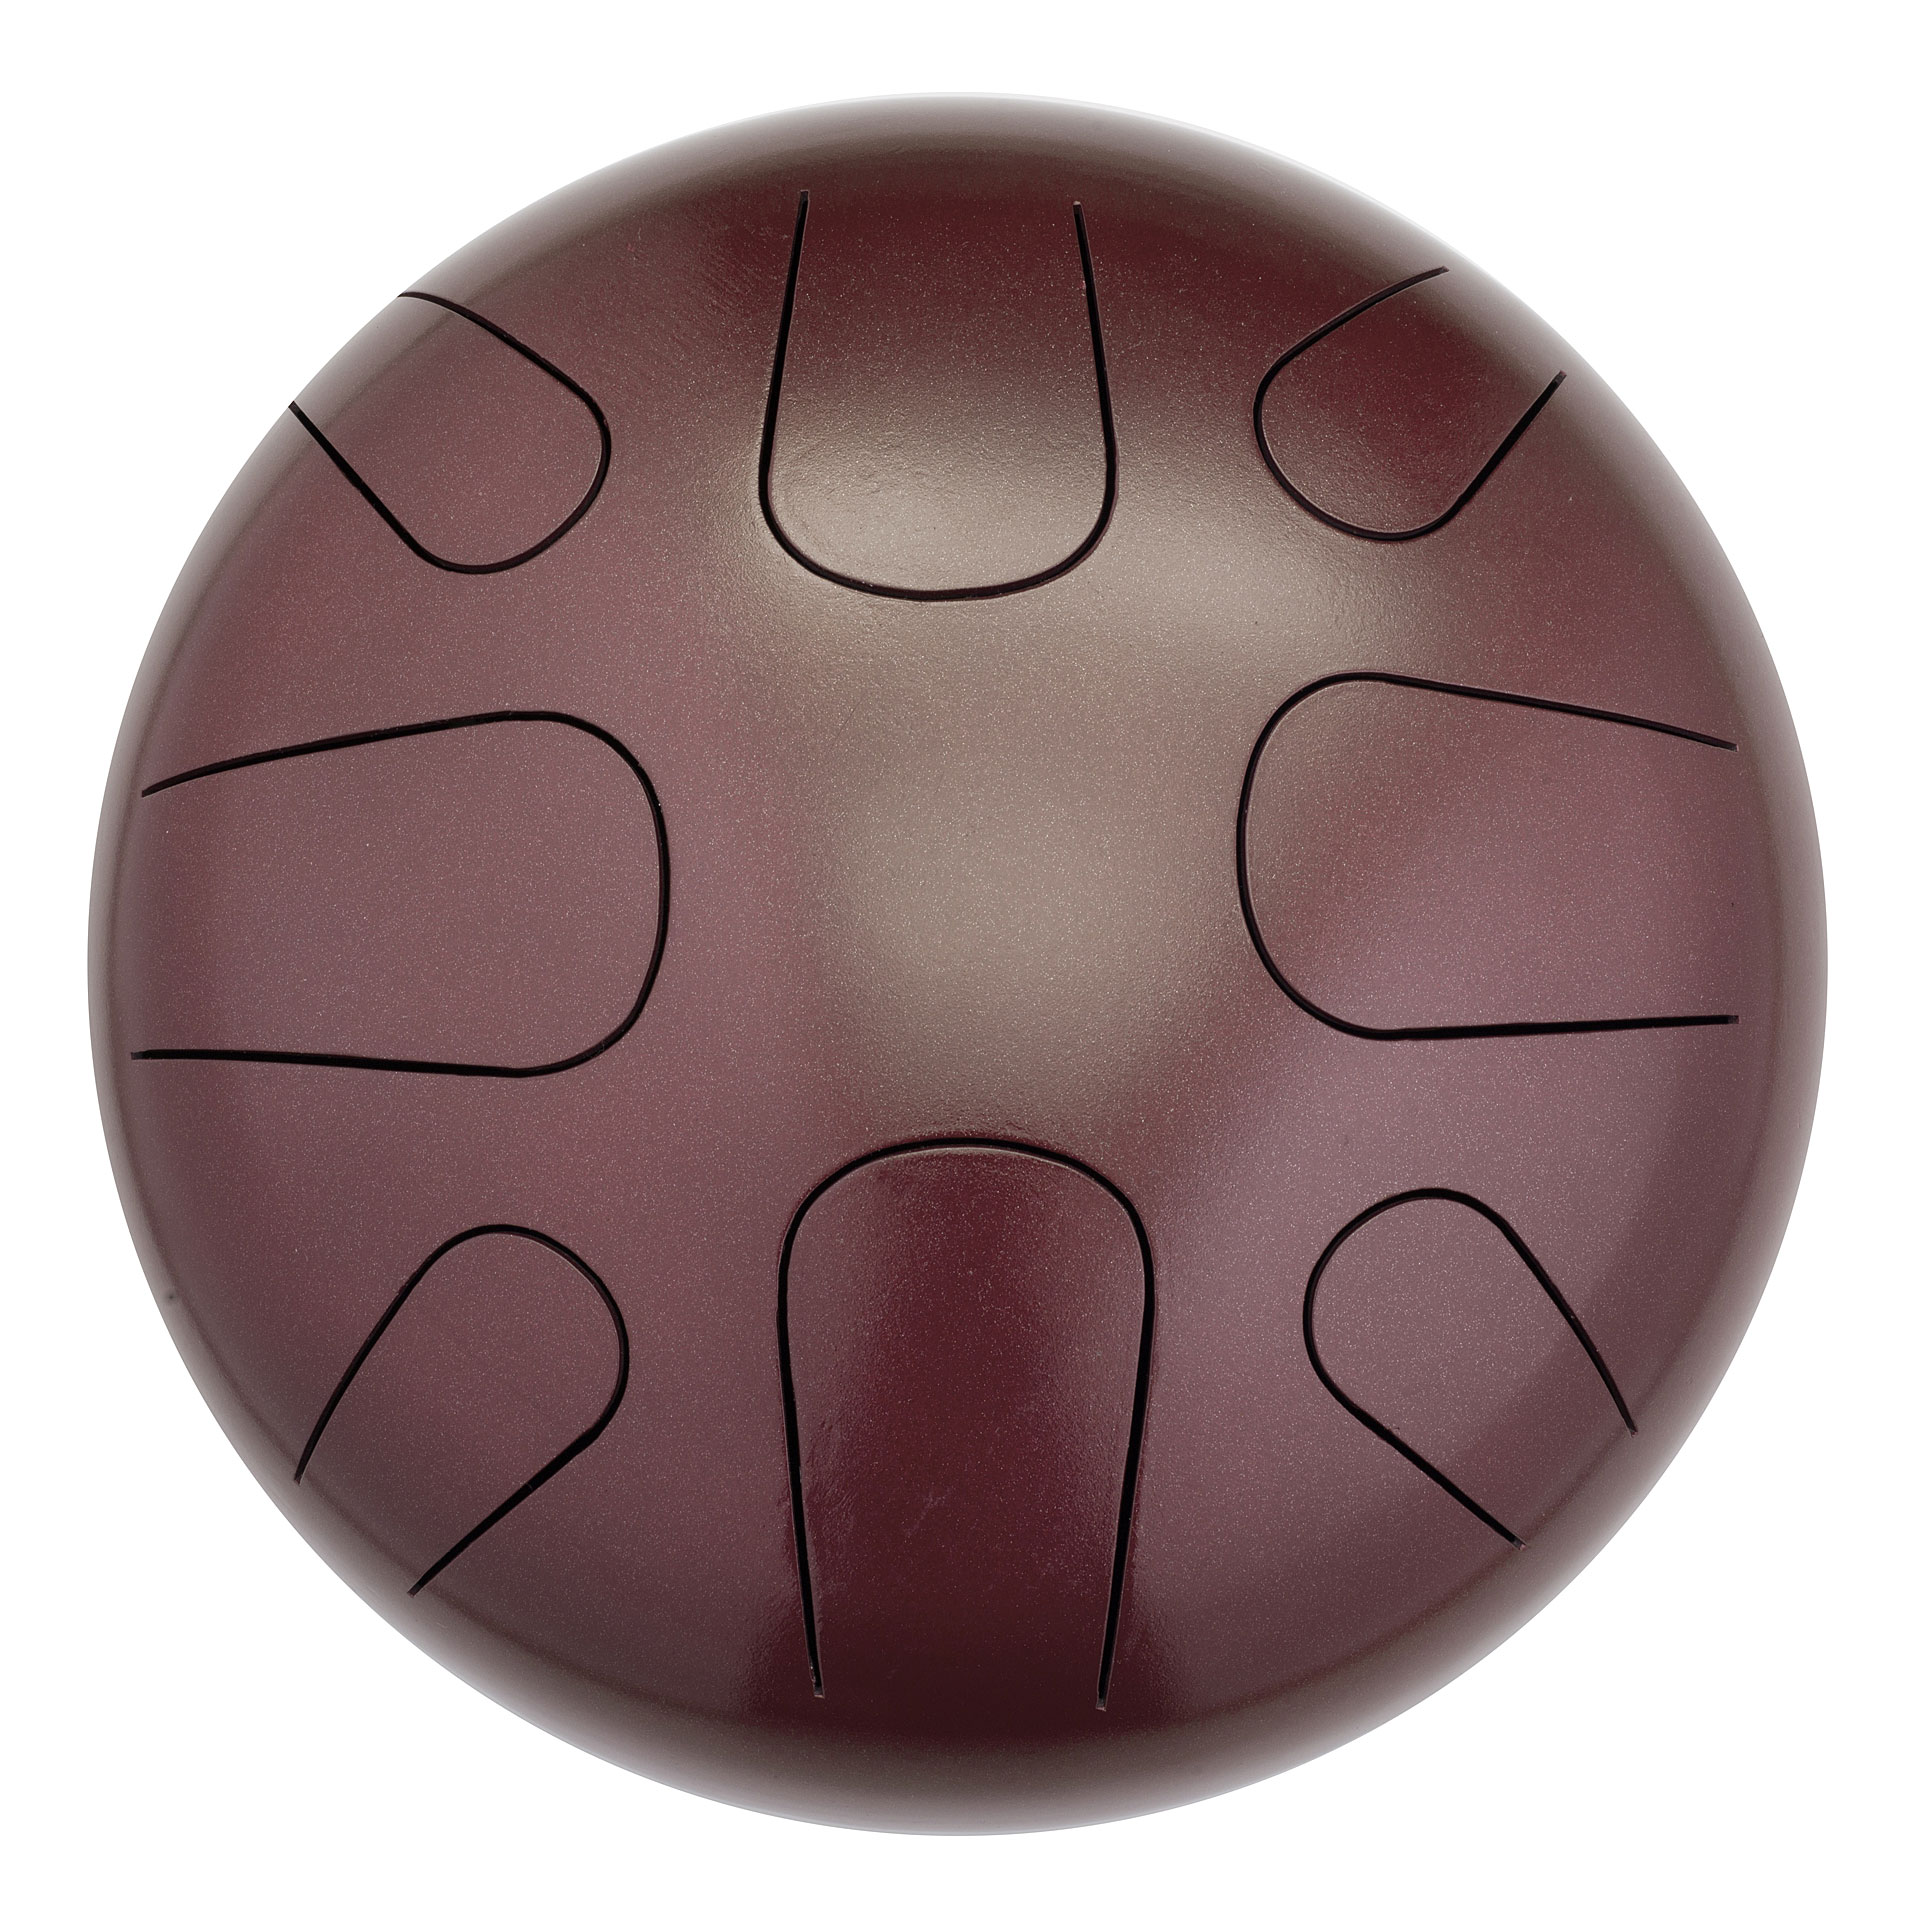 pearl awakening series tongue drum a ake bono log drum. Black Bedroom Furniture Sets. Home Design Ideas